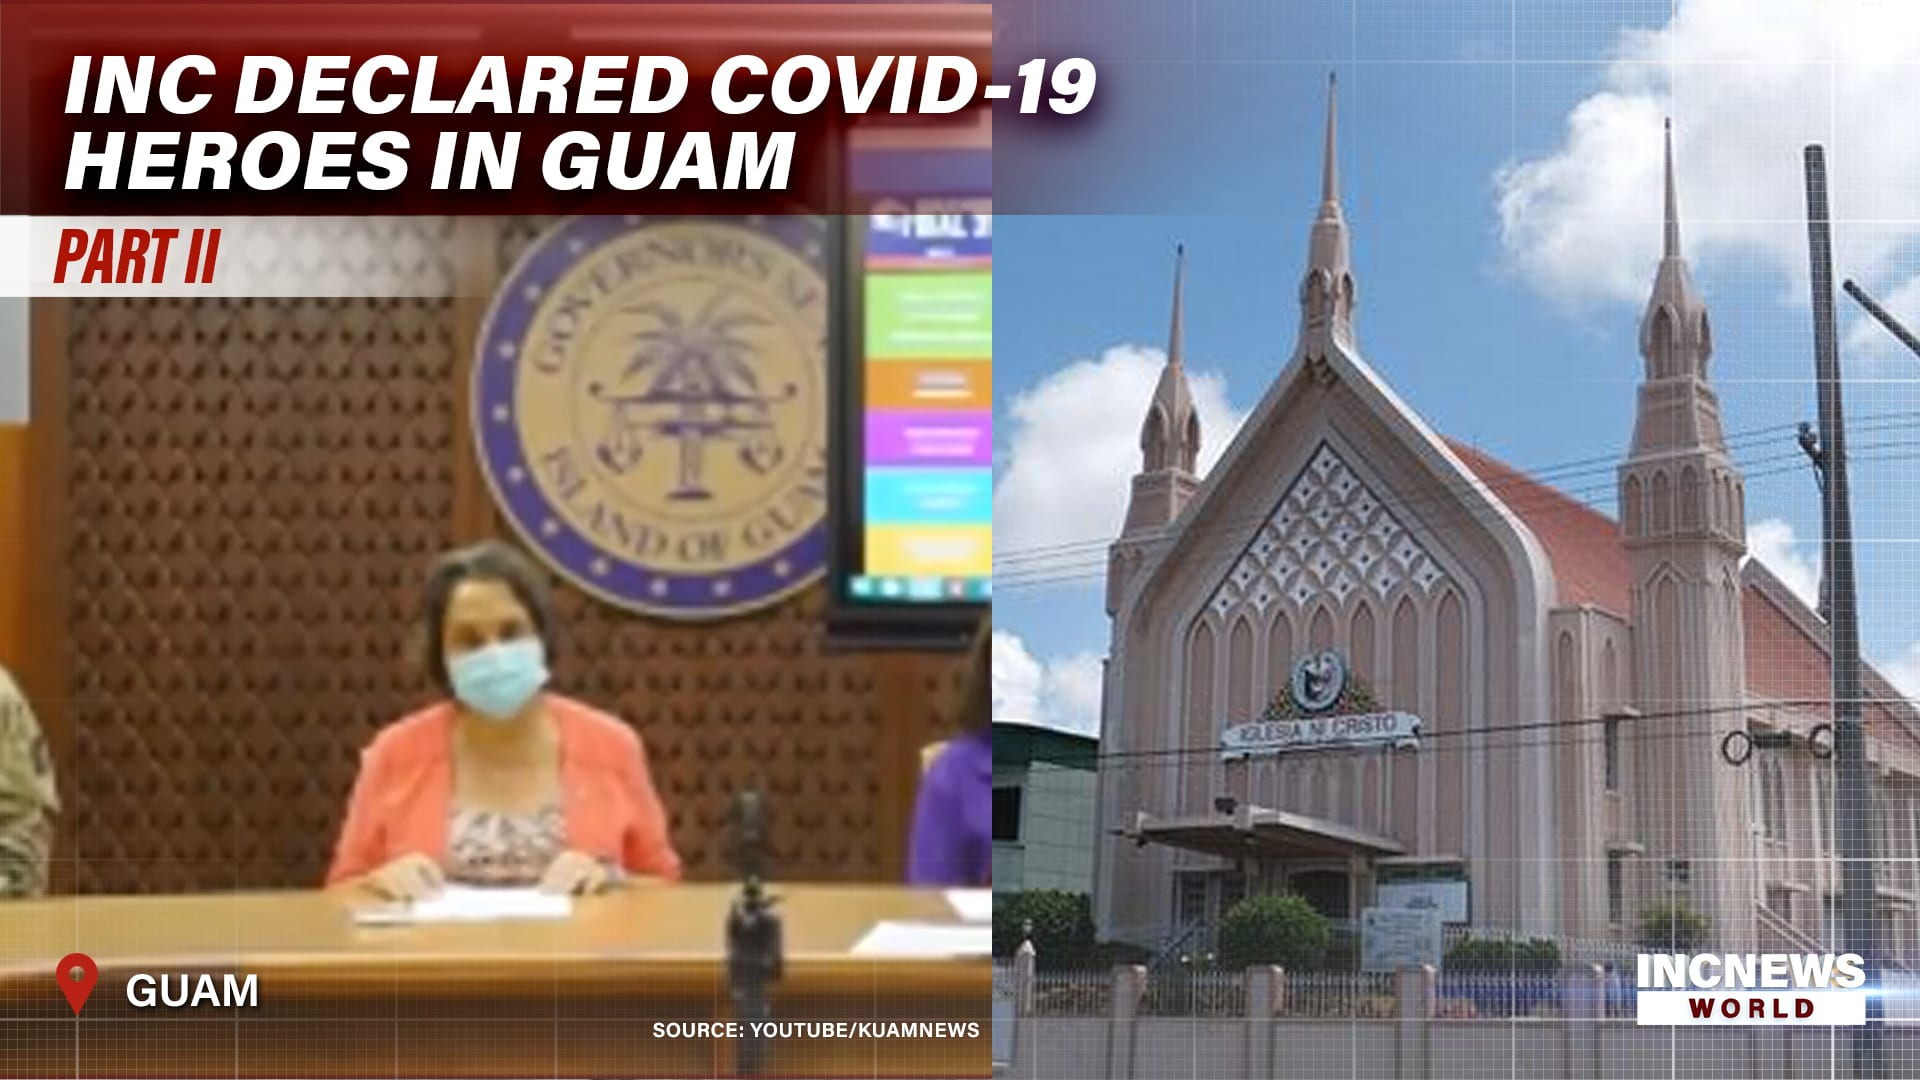 INC Declared COVID-19 Heroes in Guam